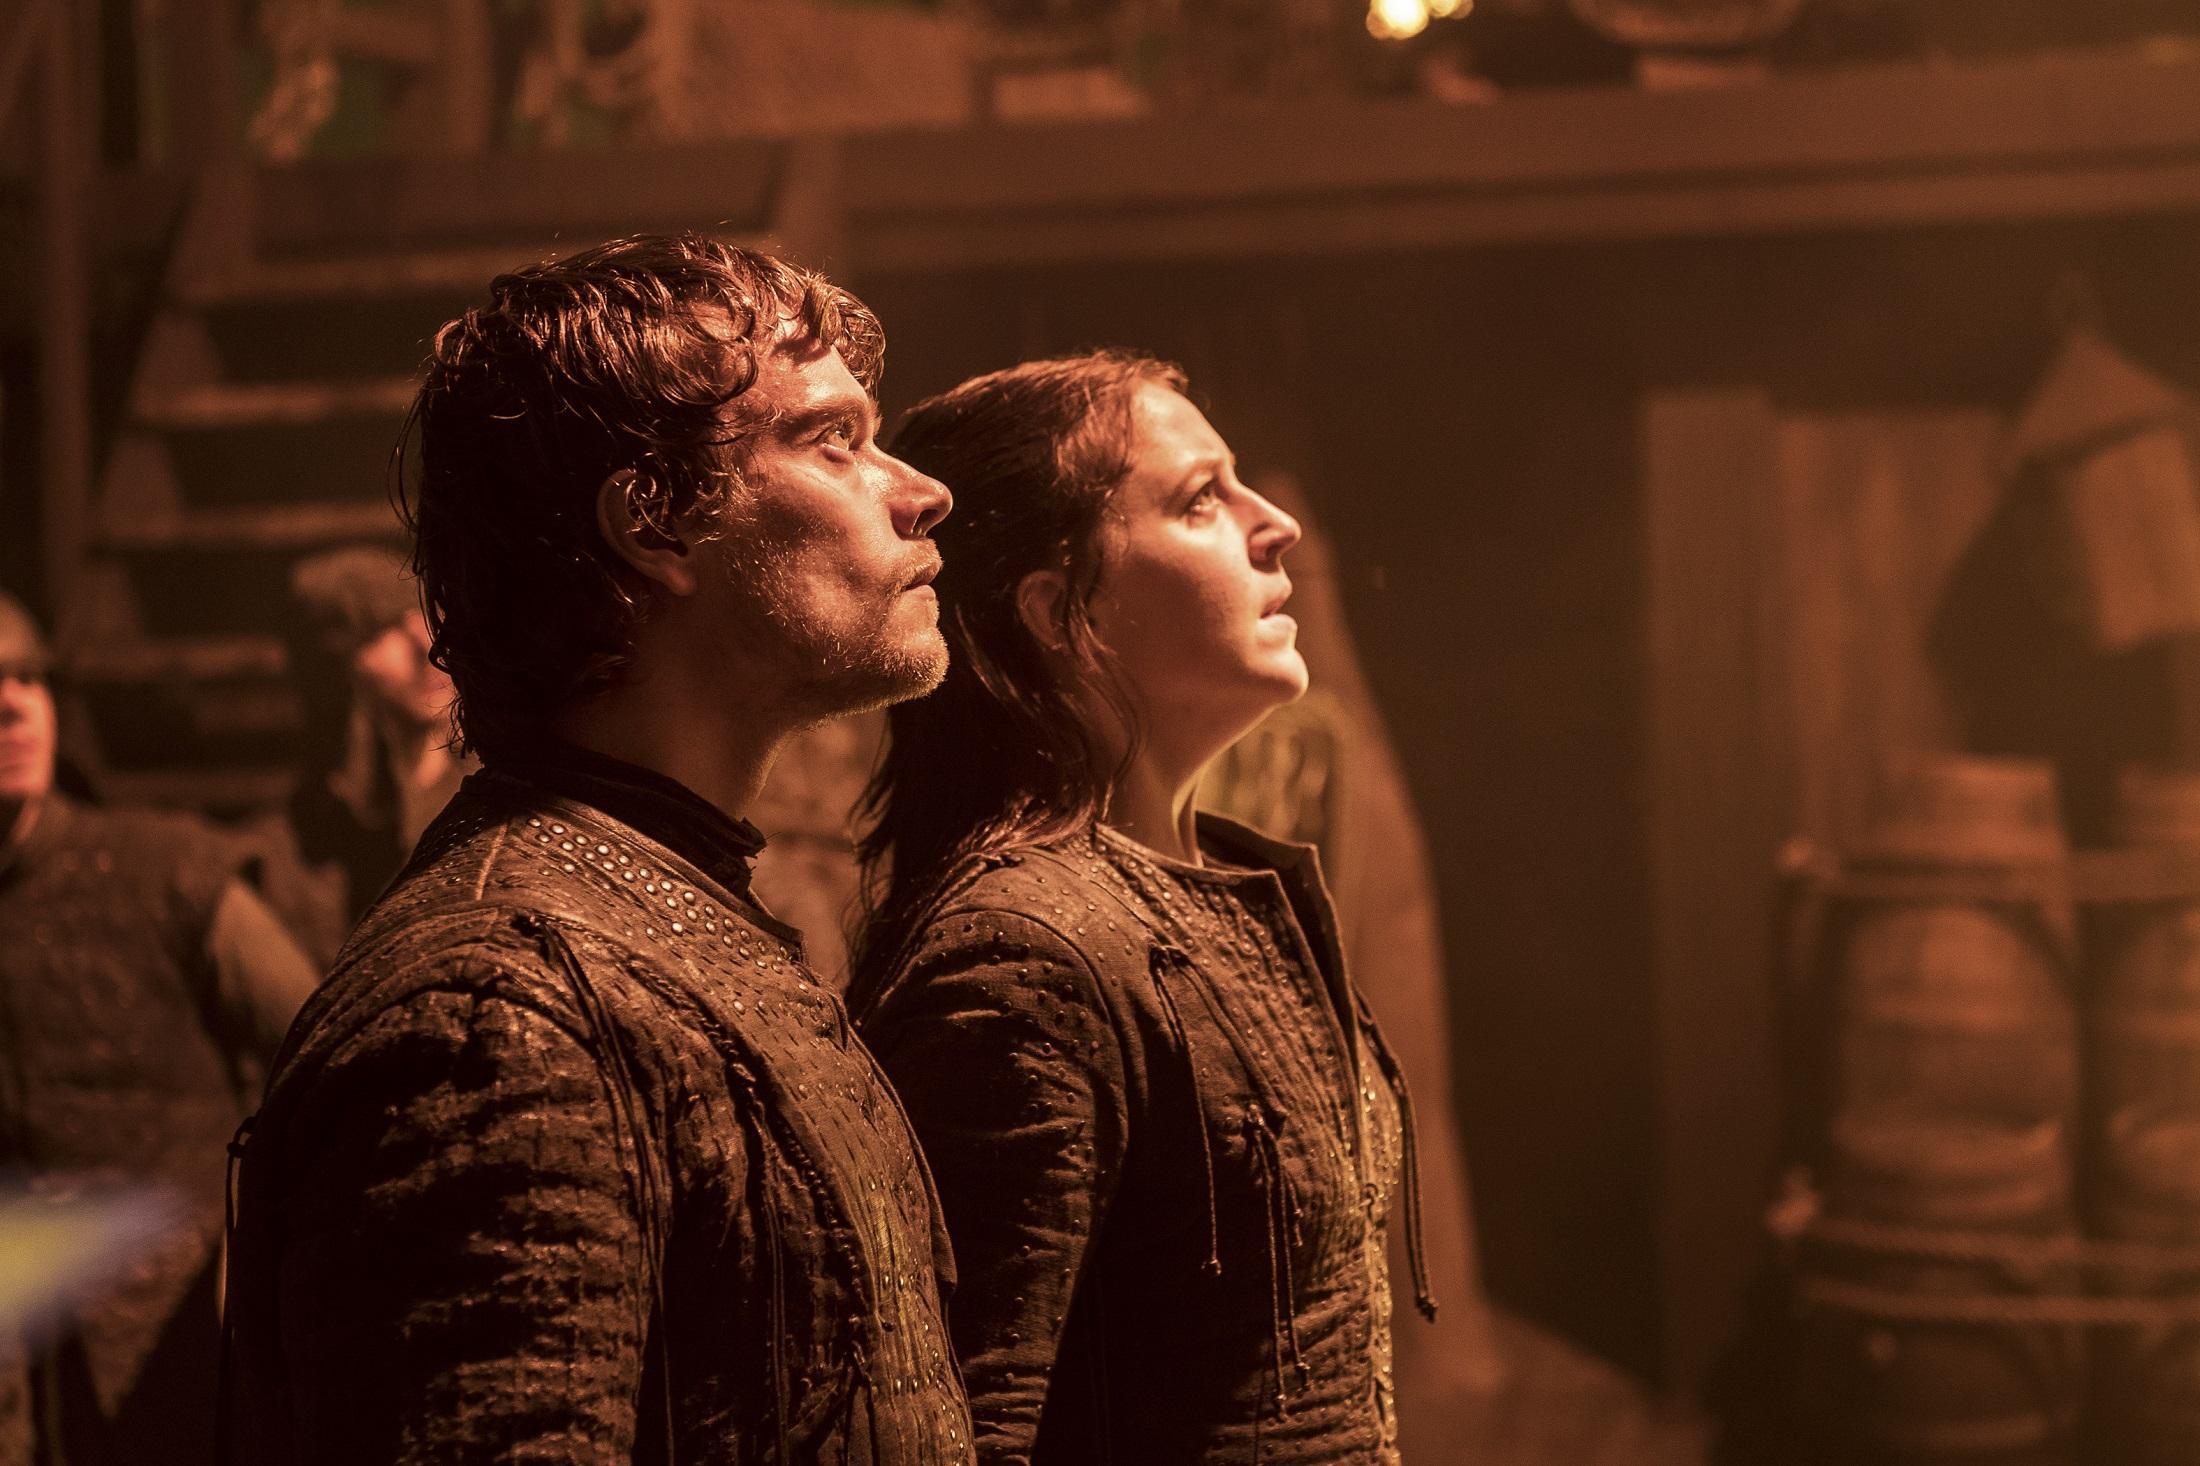 Theon and Yara admiring this week's ratings